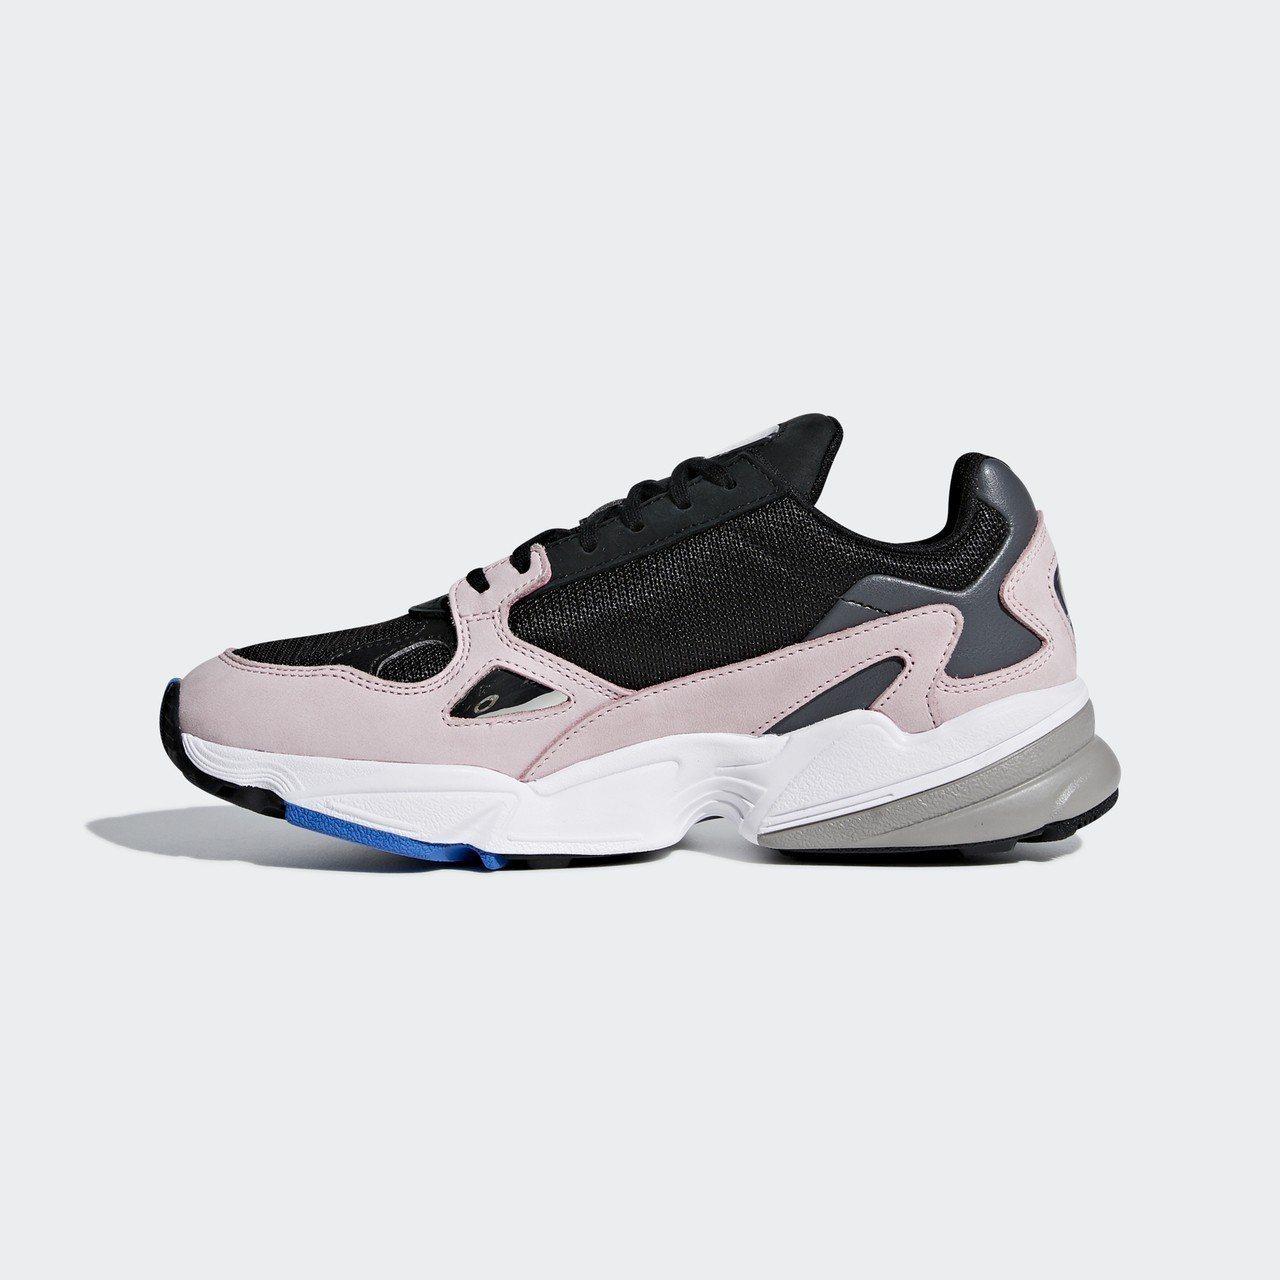 adidas Originals新系列Falcon鞋款,約3,690元。圖/ad...